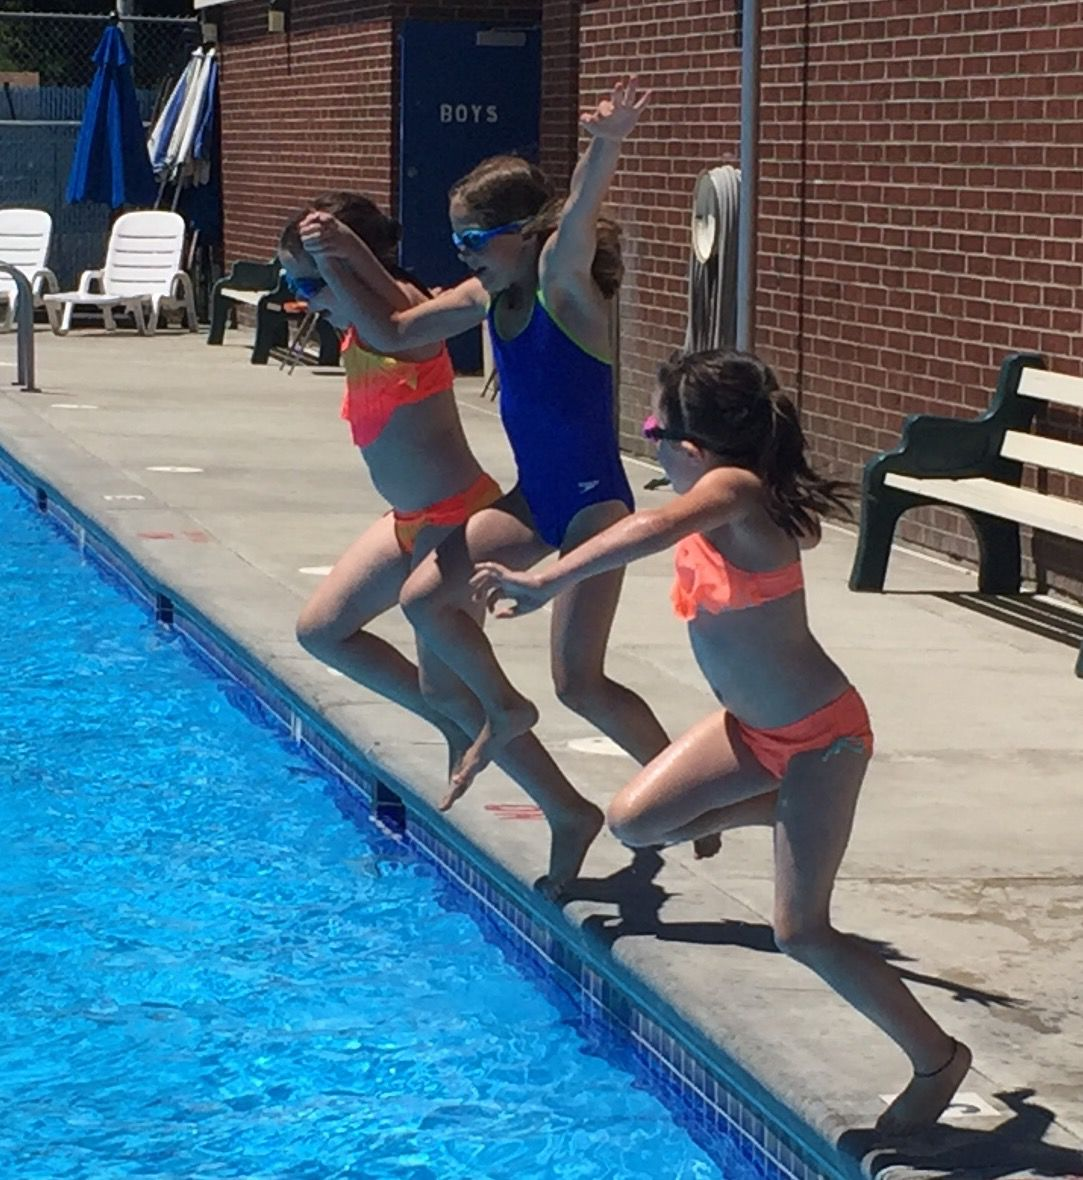 Nezperce pool opens June 1